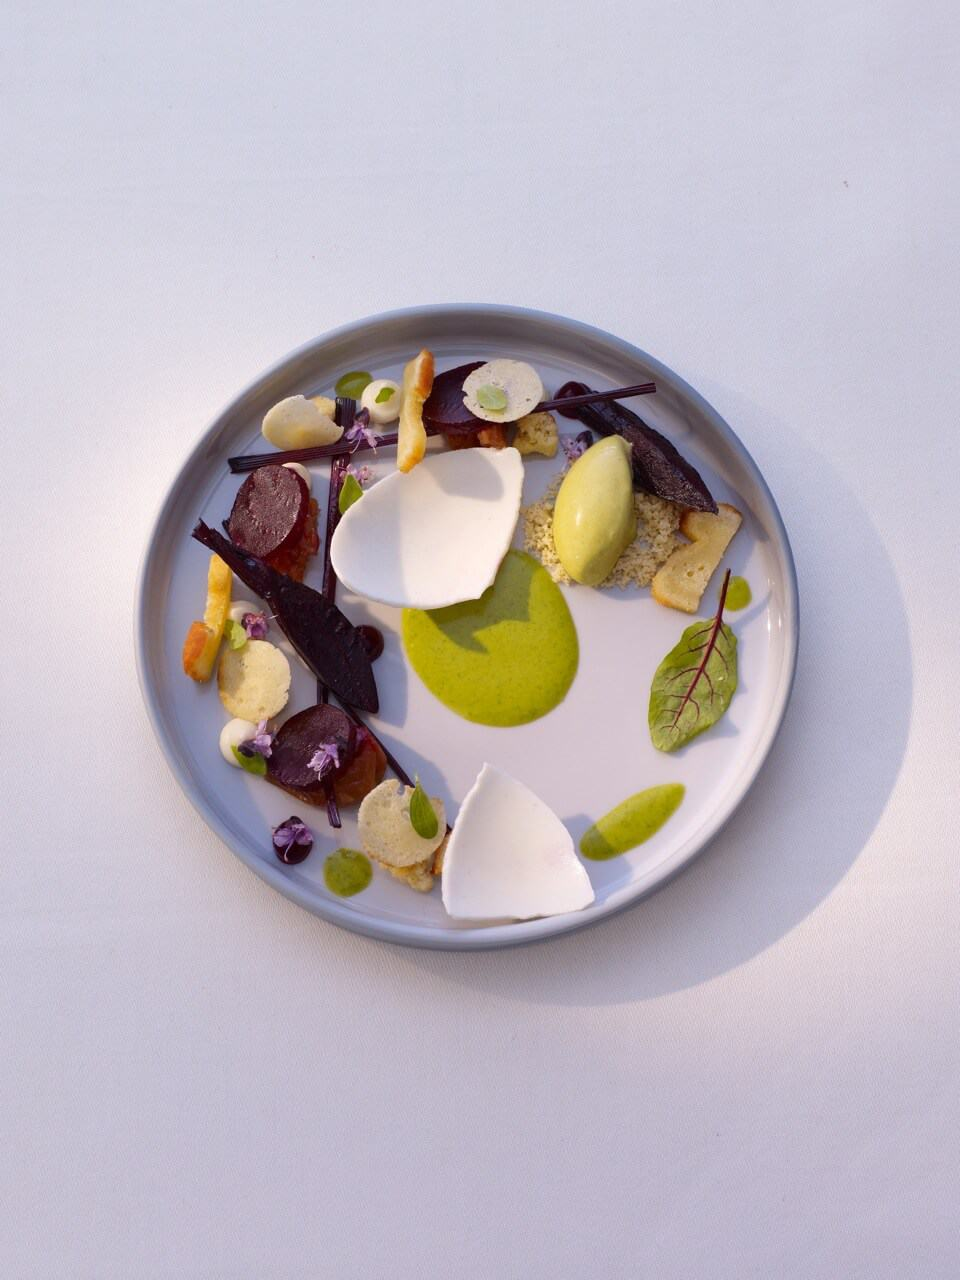 Pistachio Ice Cream Recipe With Gorgonzola, Beetroot & Umeboshi Plum